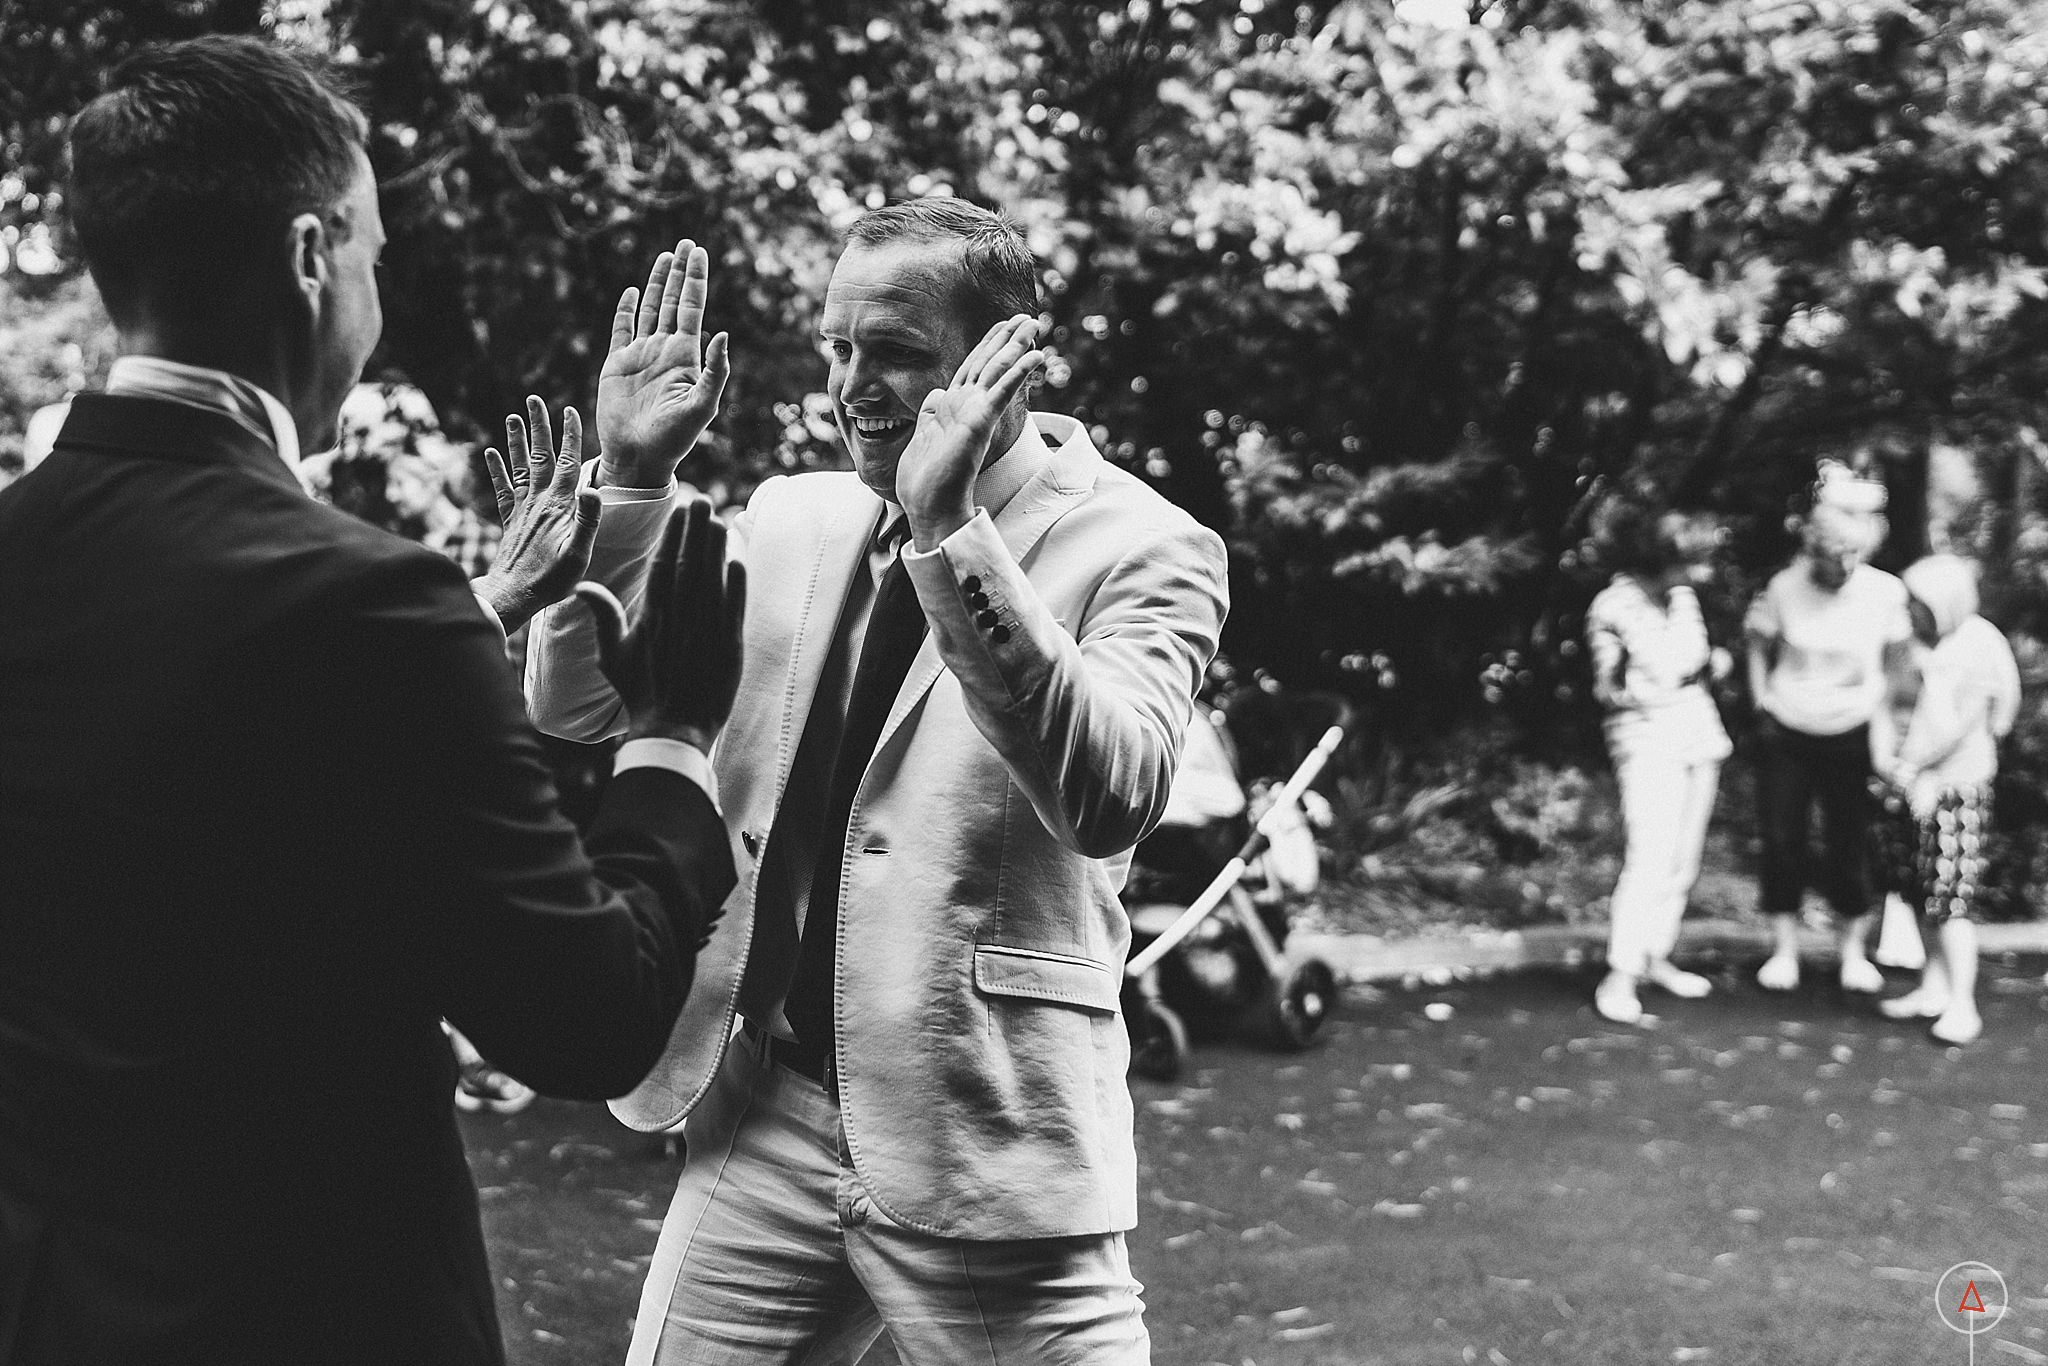 cardiff-wedding-photographer-aga-tomaszek_0361